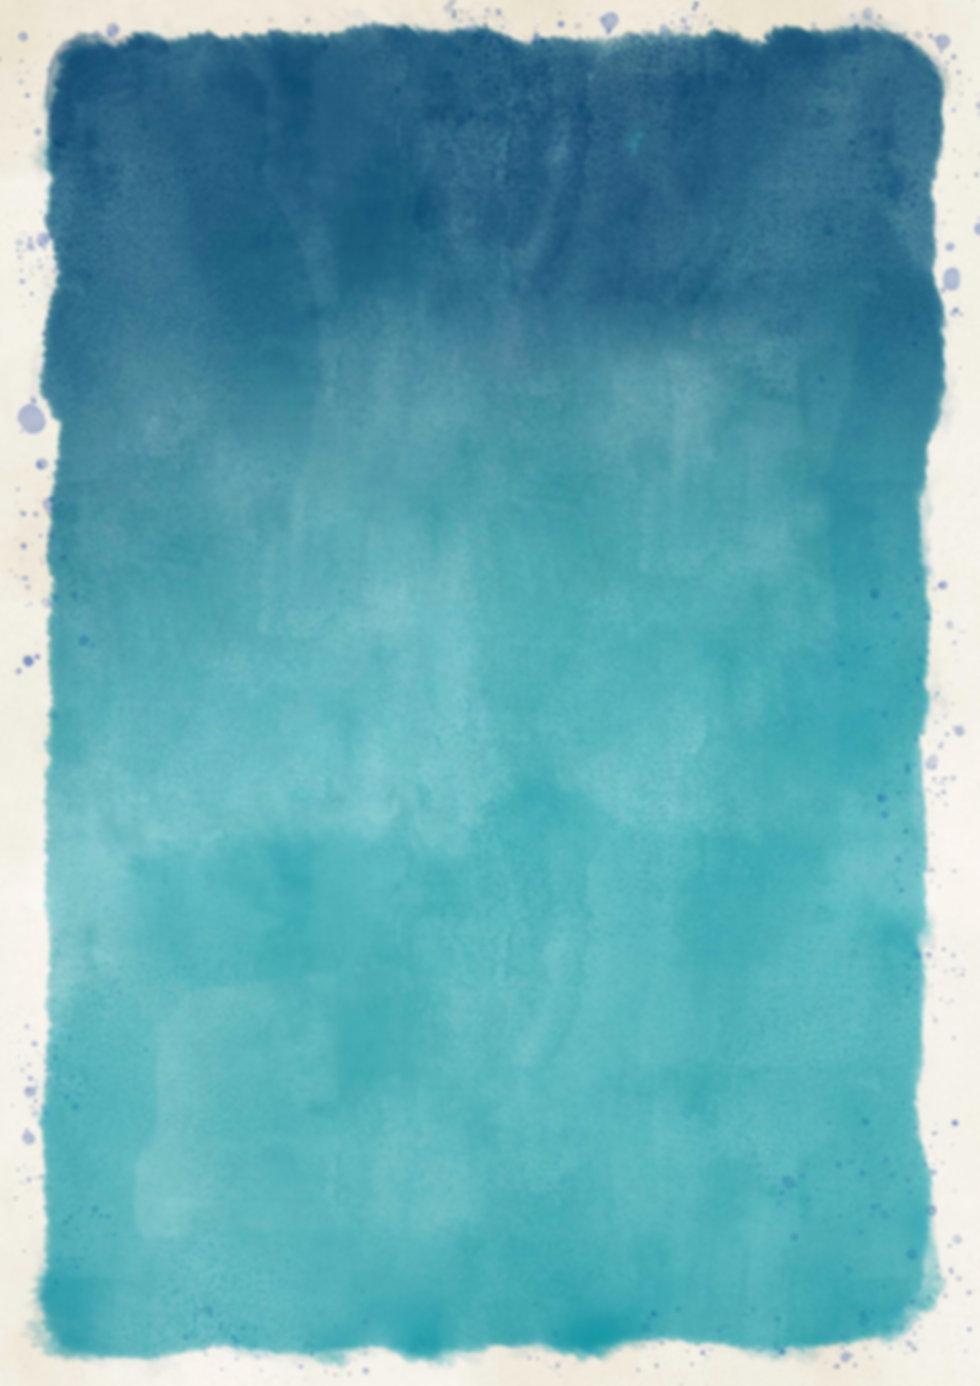 background-blue 2.jpg